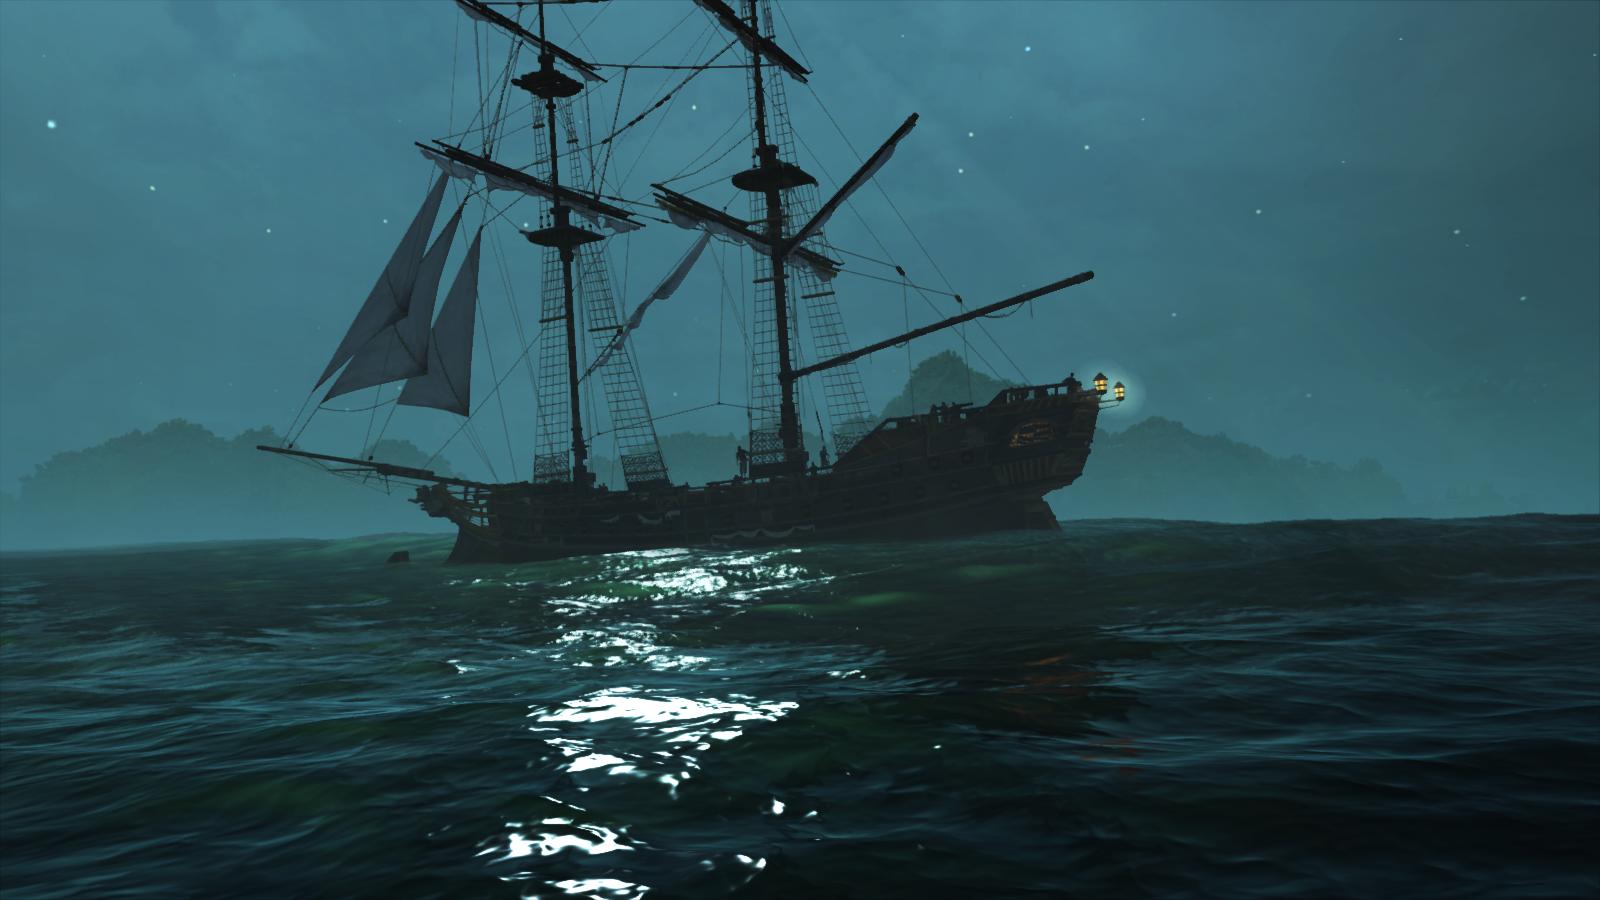 Assassins Creed Iv Black Flag Jackdaw At Night By Saurabh001 On